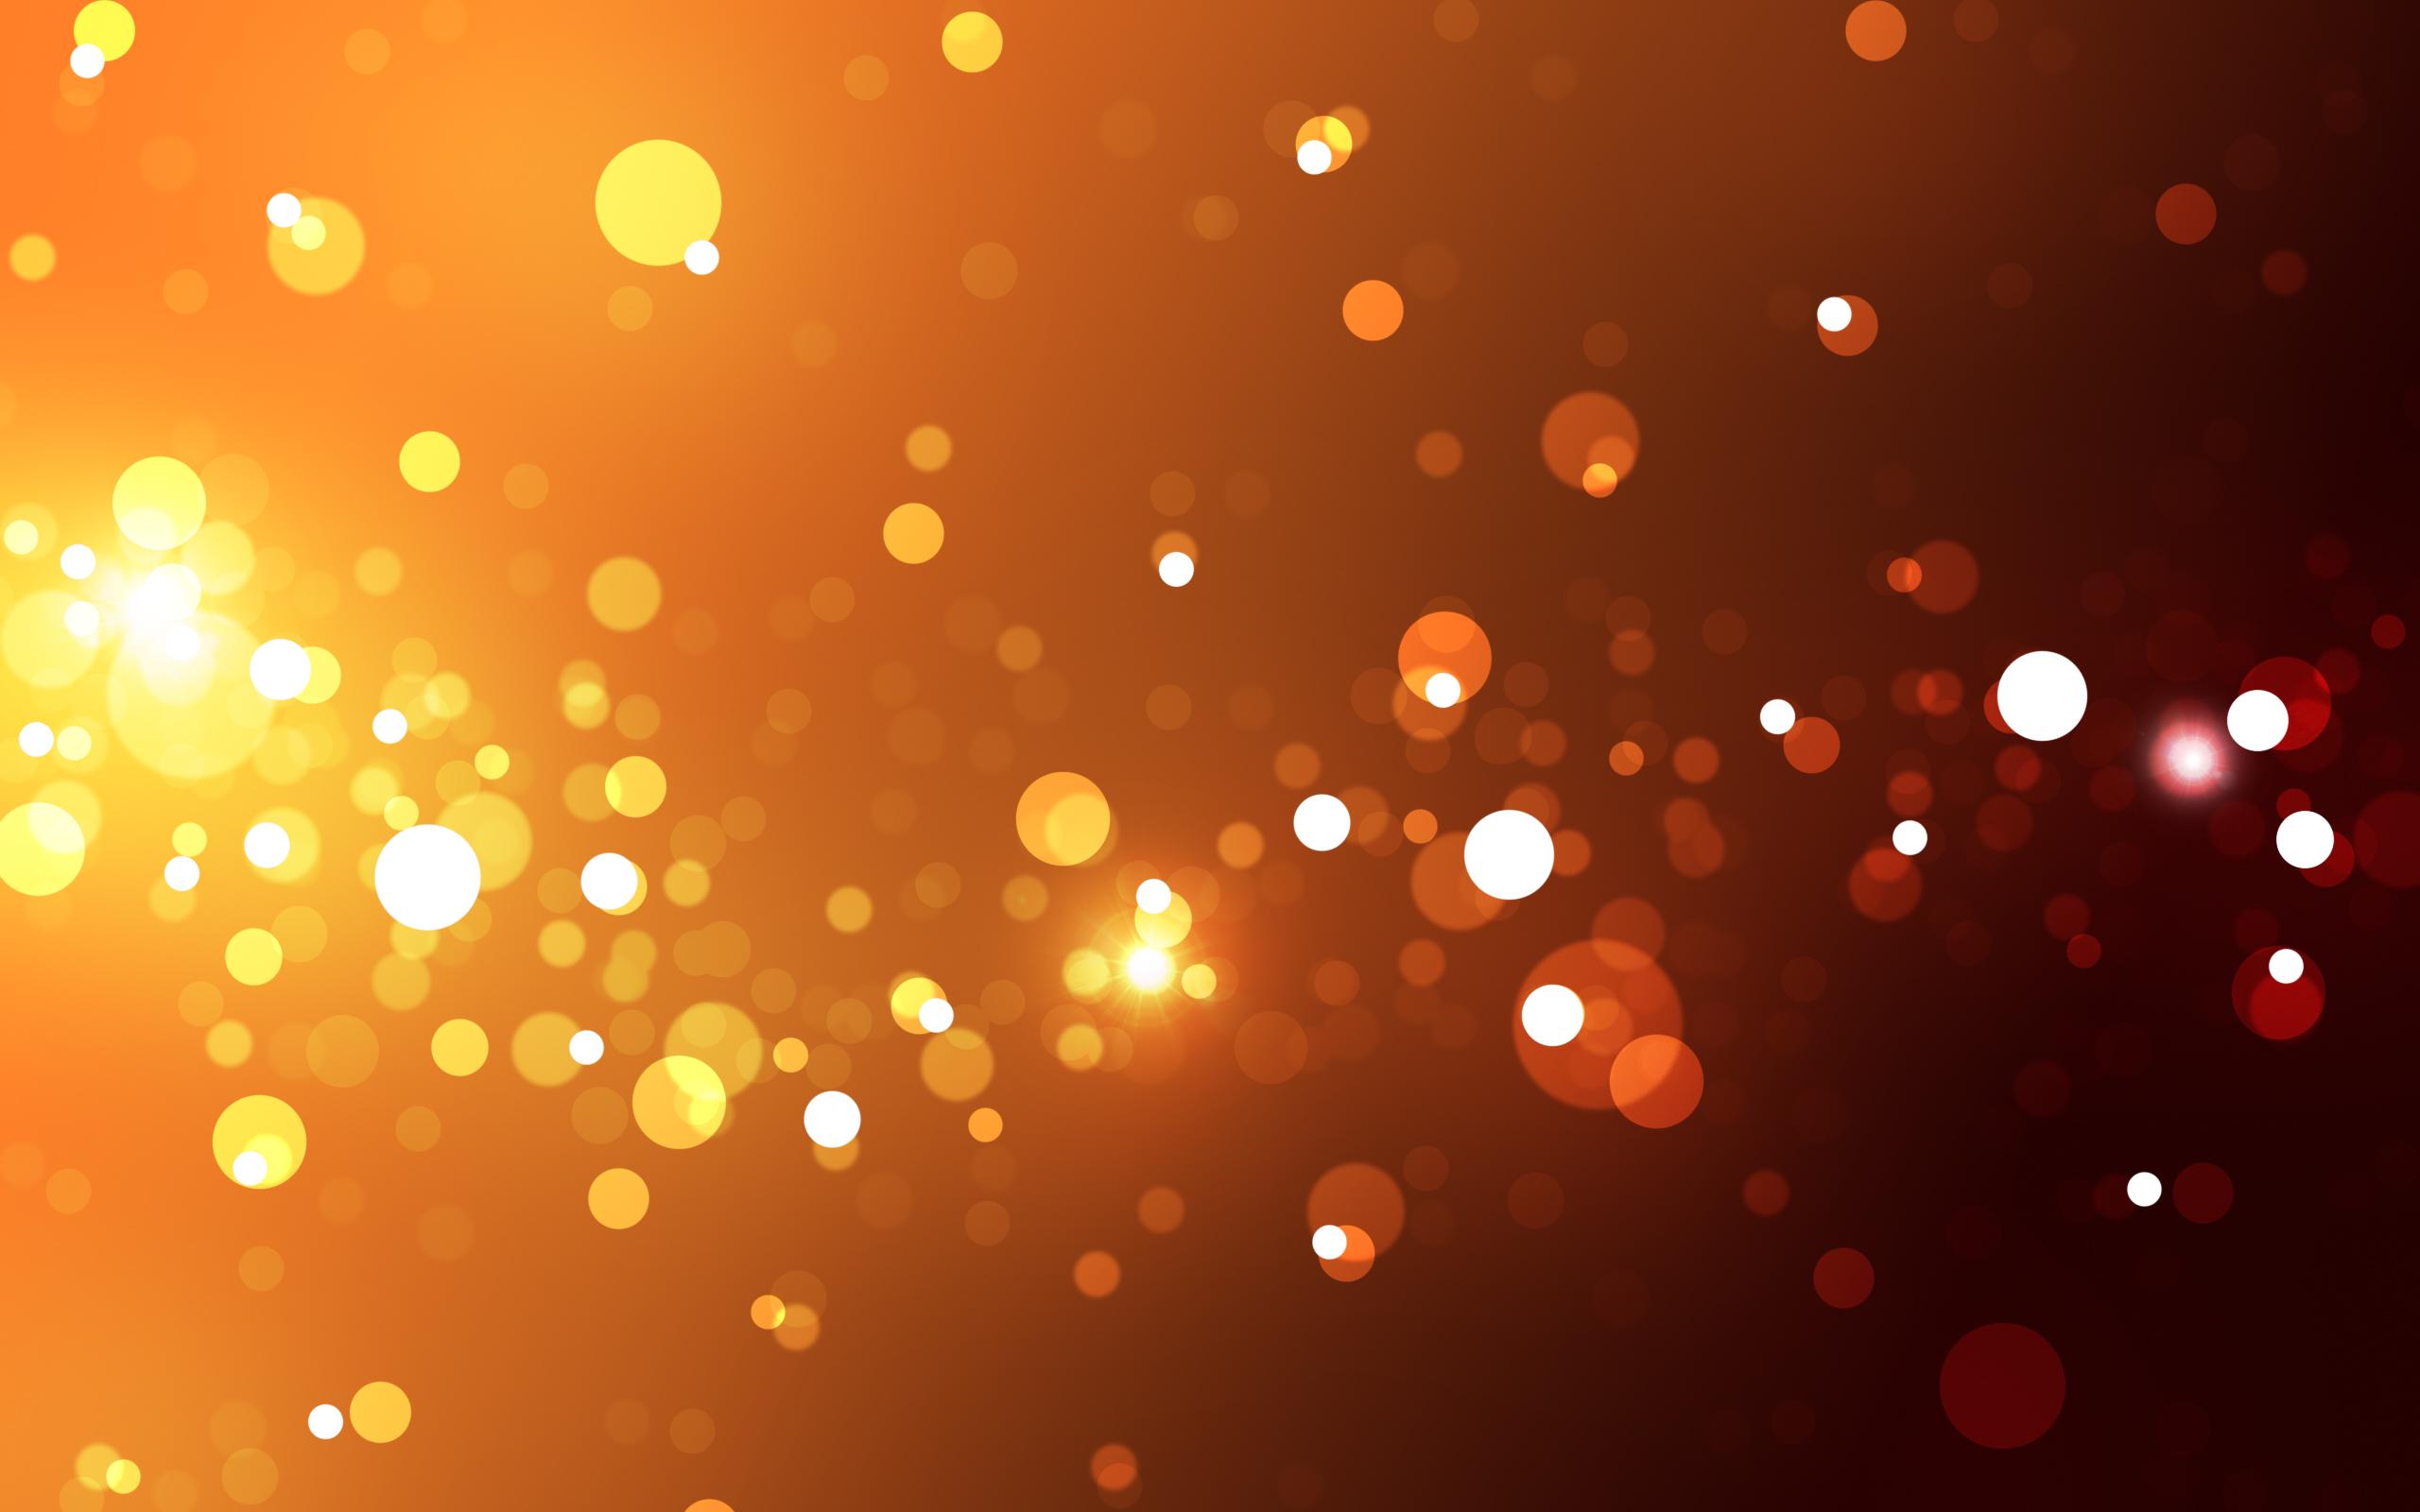 Awesome Orange Light Wallpaper